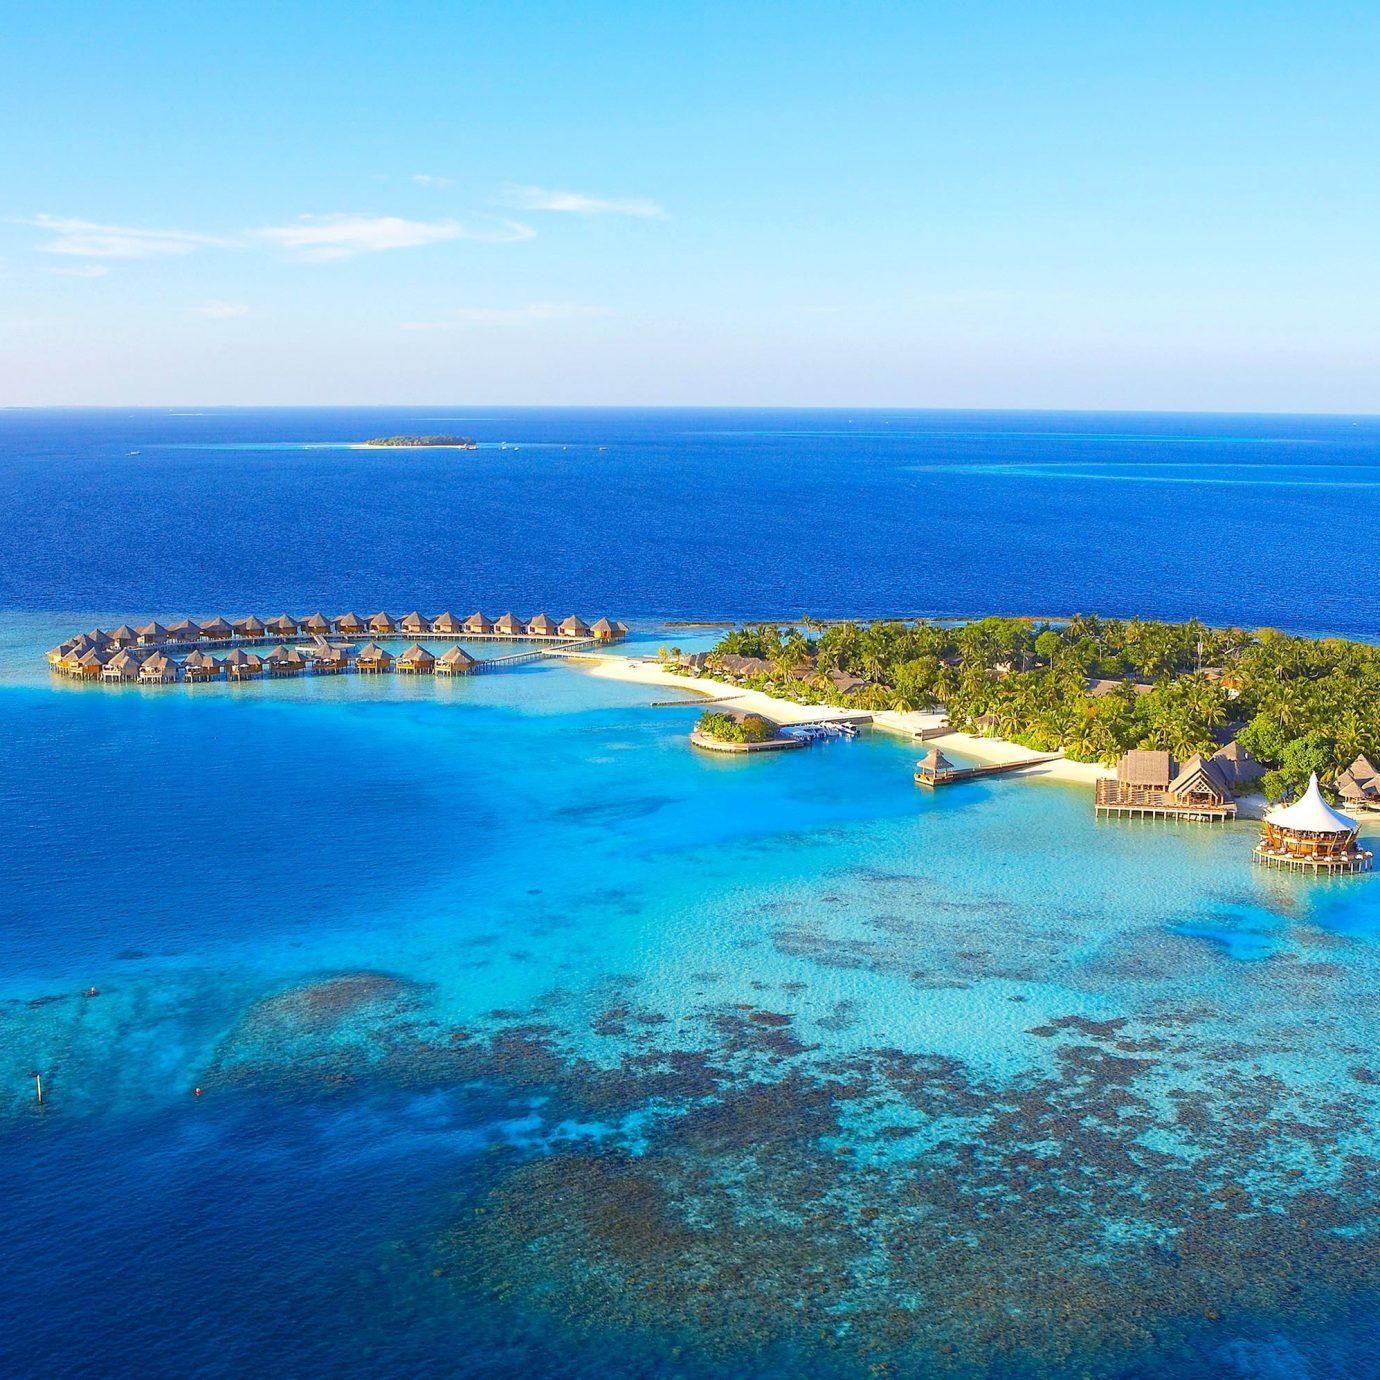 Trip Ideas water sky Nature blue reef Ocean outdoor geographical feature landform Sea archipelago horizon Coast islet caribbean Beach bay Island Lagoon cape atoll swimming Resort cove clear shore